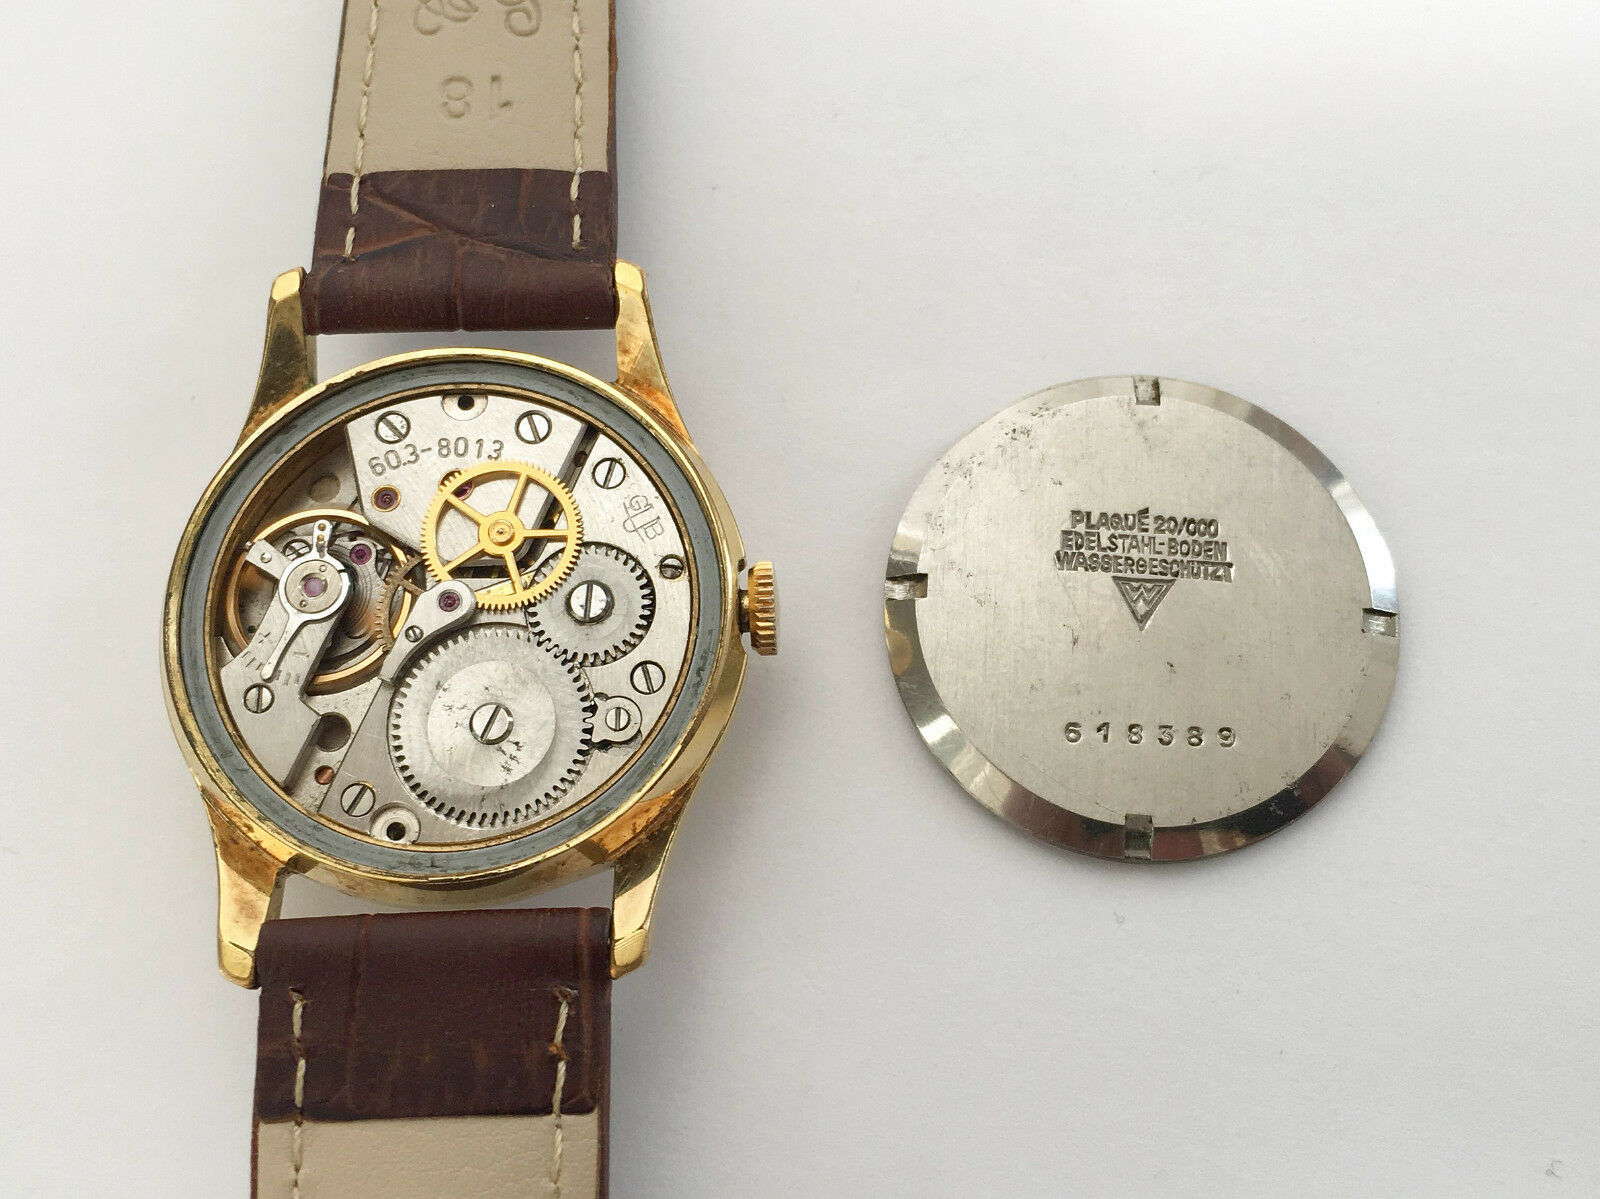 Vintage Rare GLASHUTTE GUB Q1 Chronometre cal. 60.3 Mechanical Germany Watch image 8